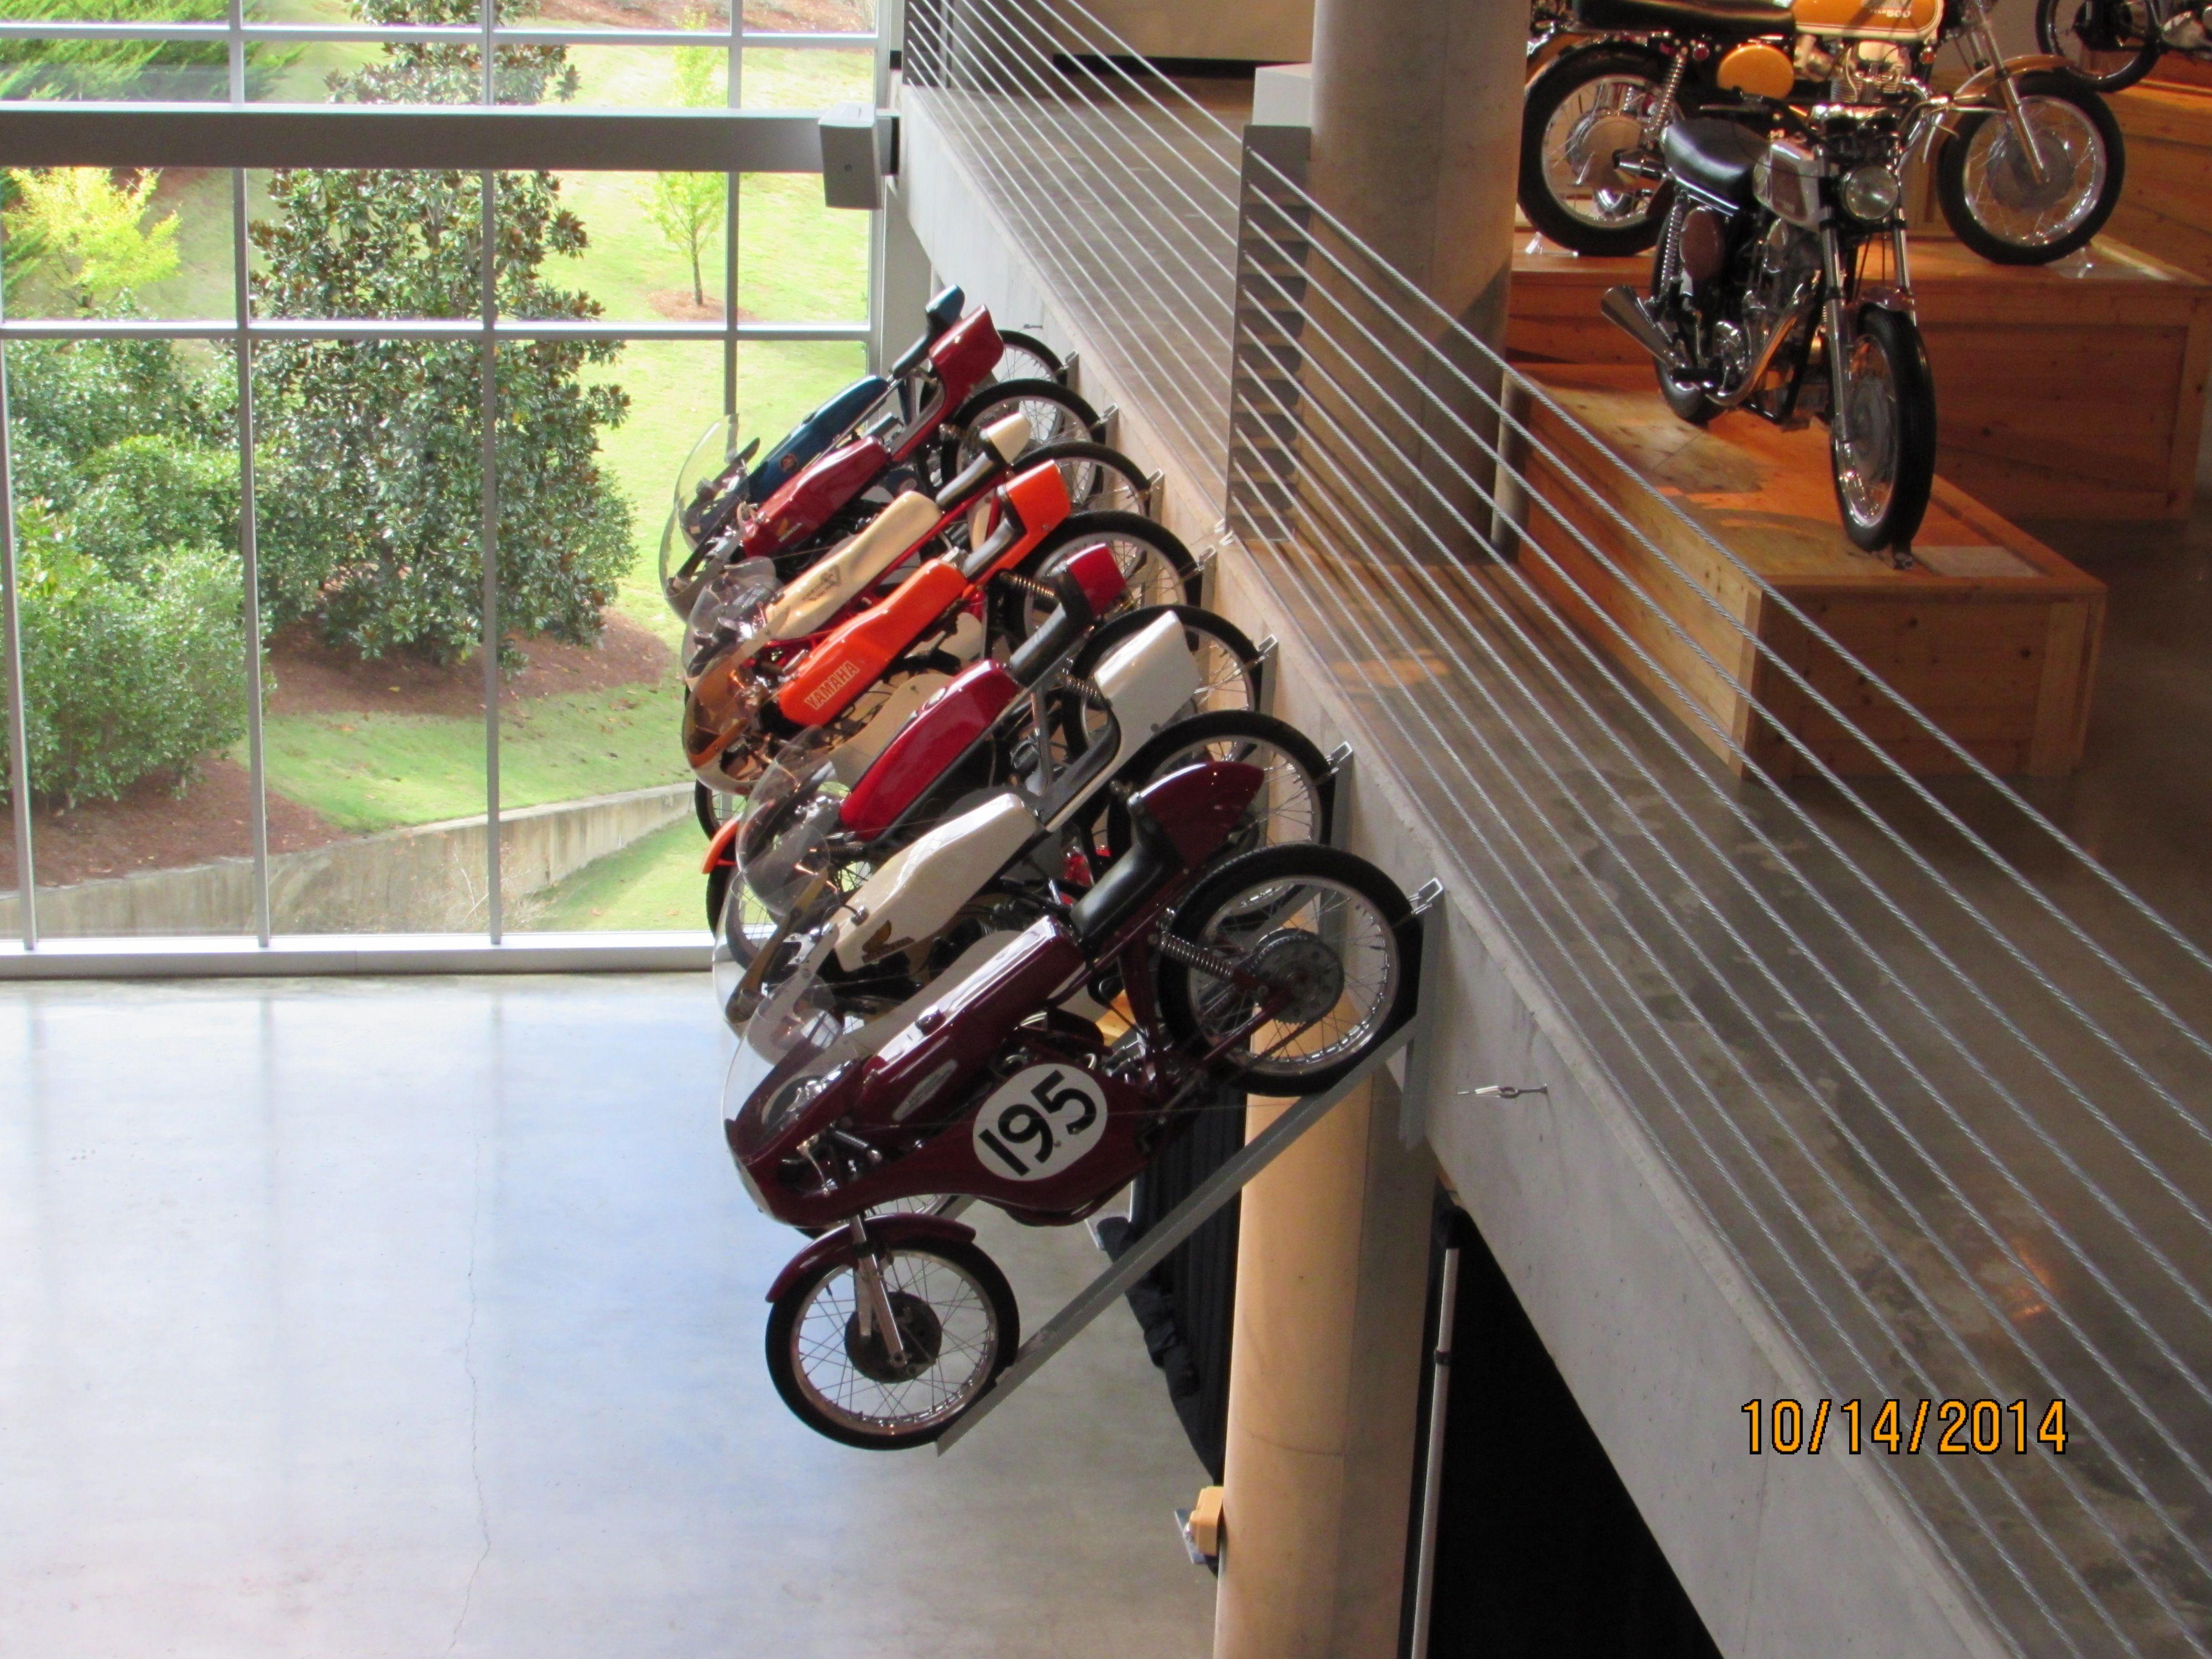 Выбираем место для хранения мотоцикла